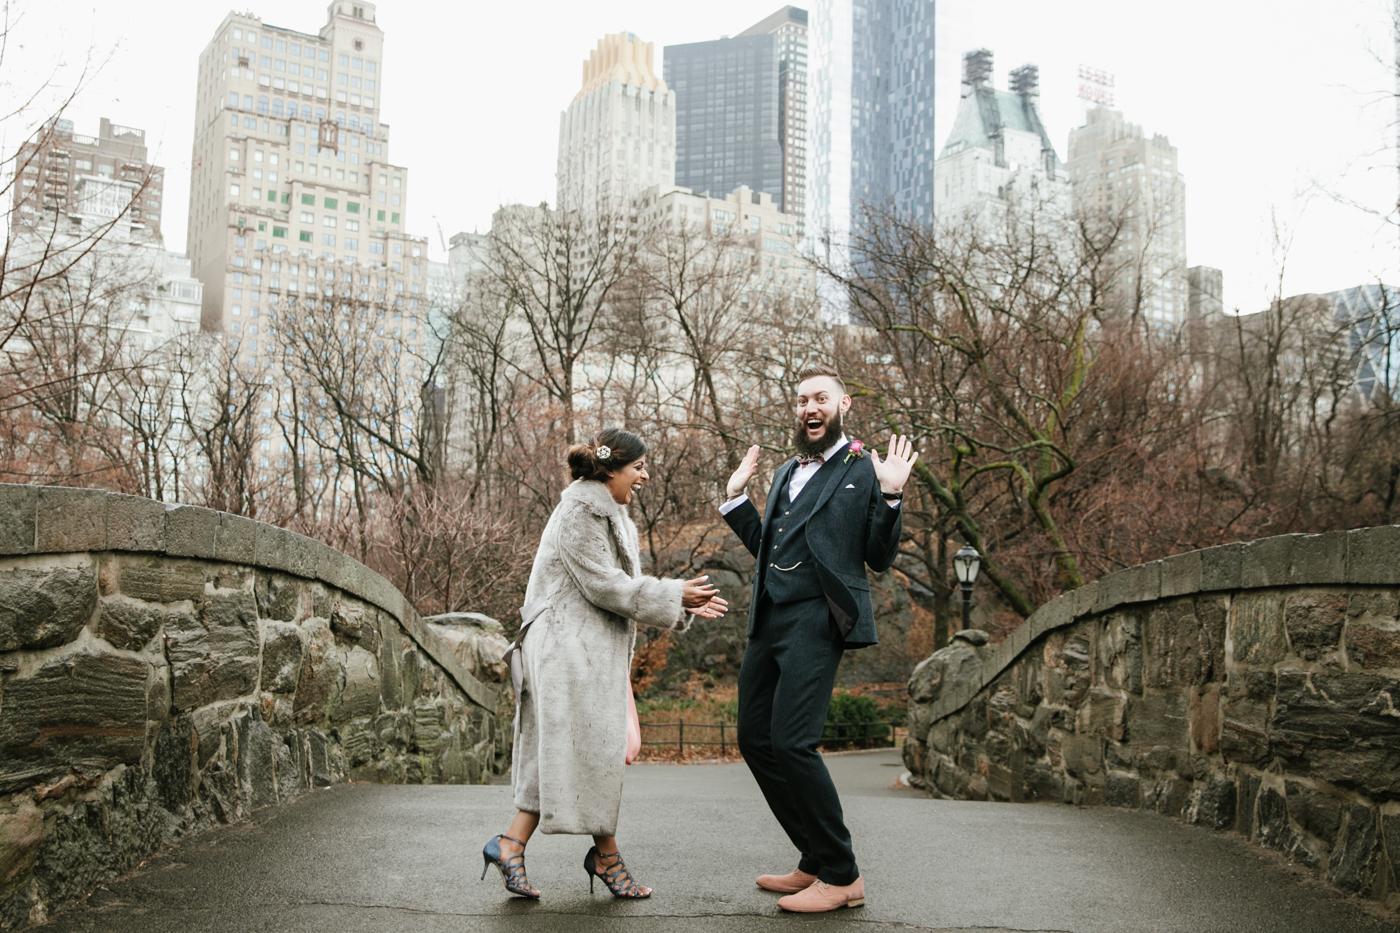 Central-park-wedding-by-Tanya-Isaeva-91.jpg